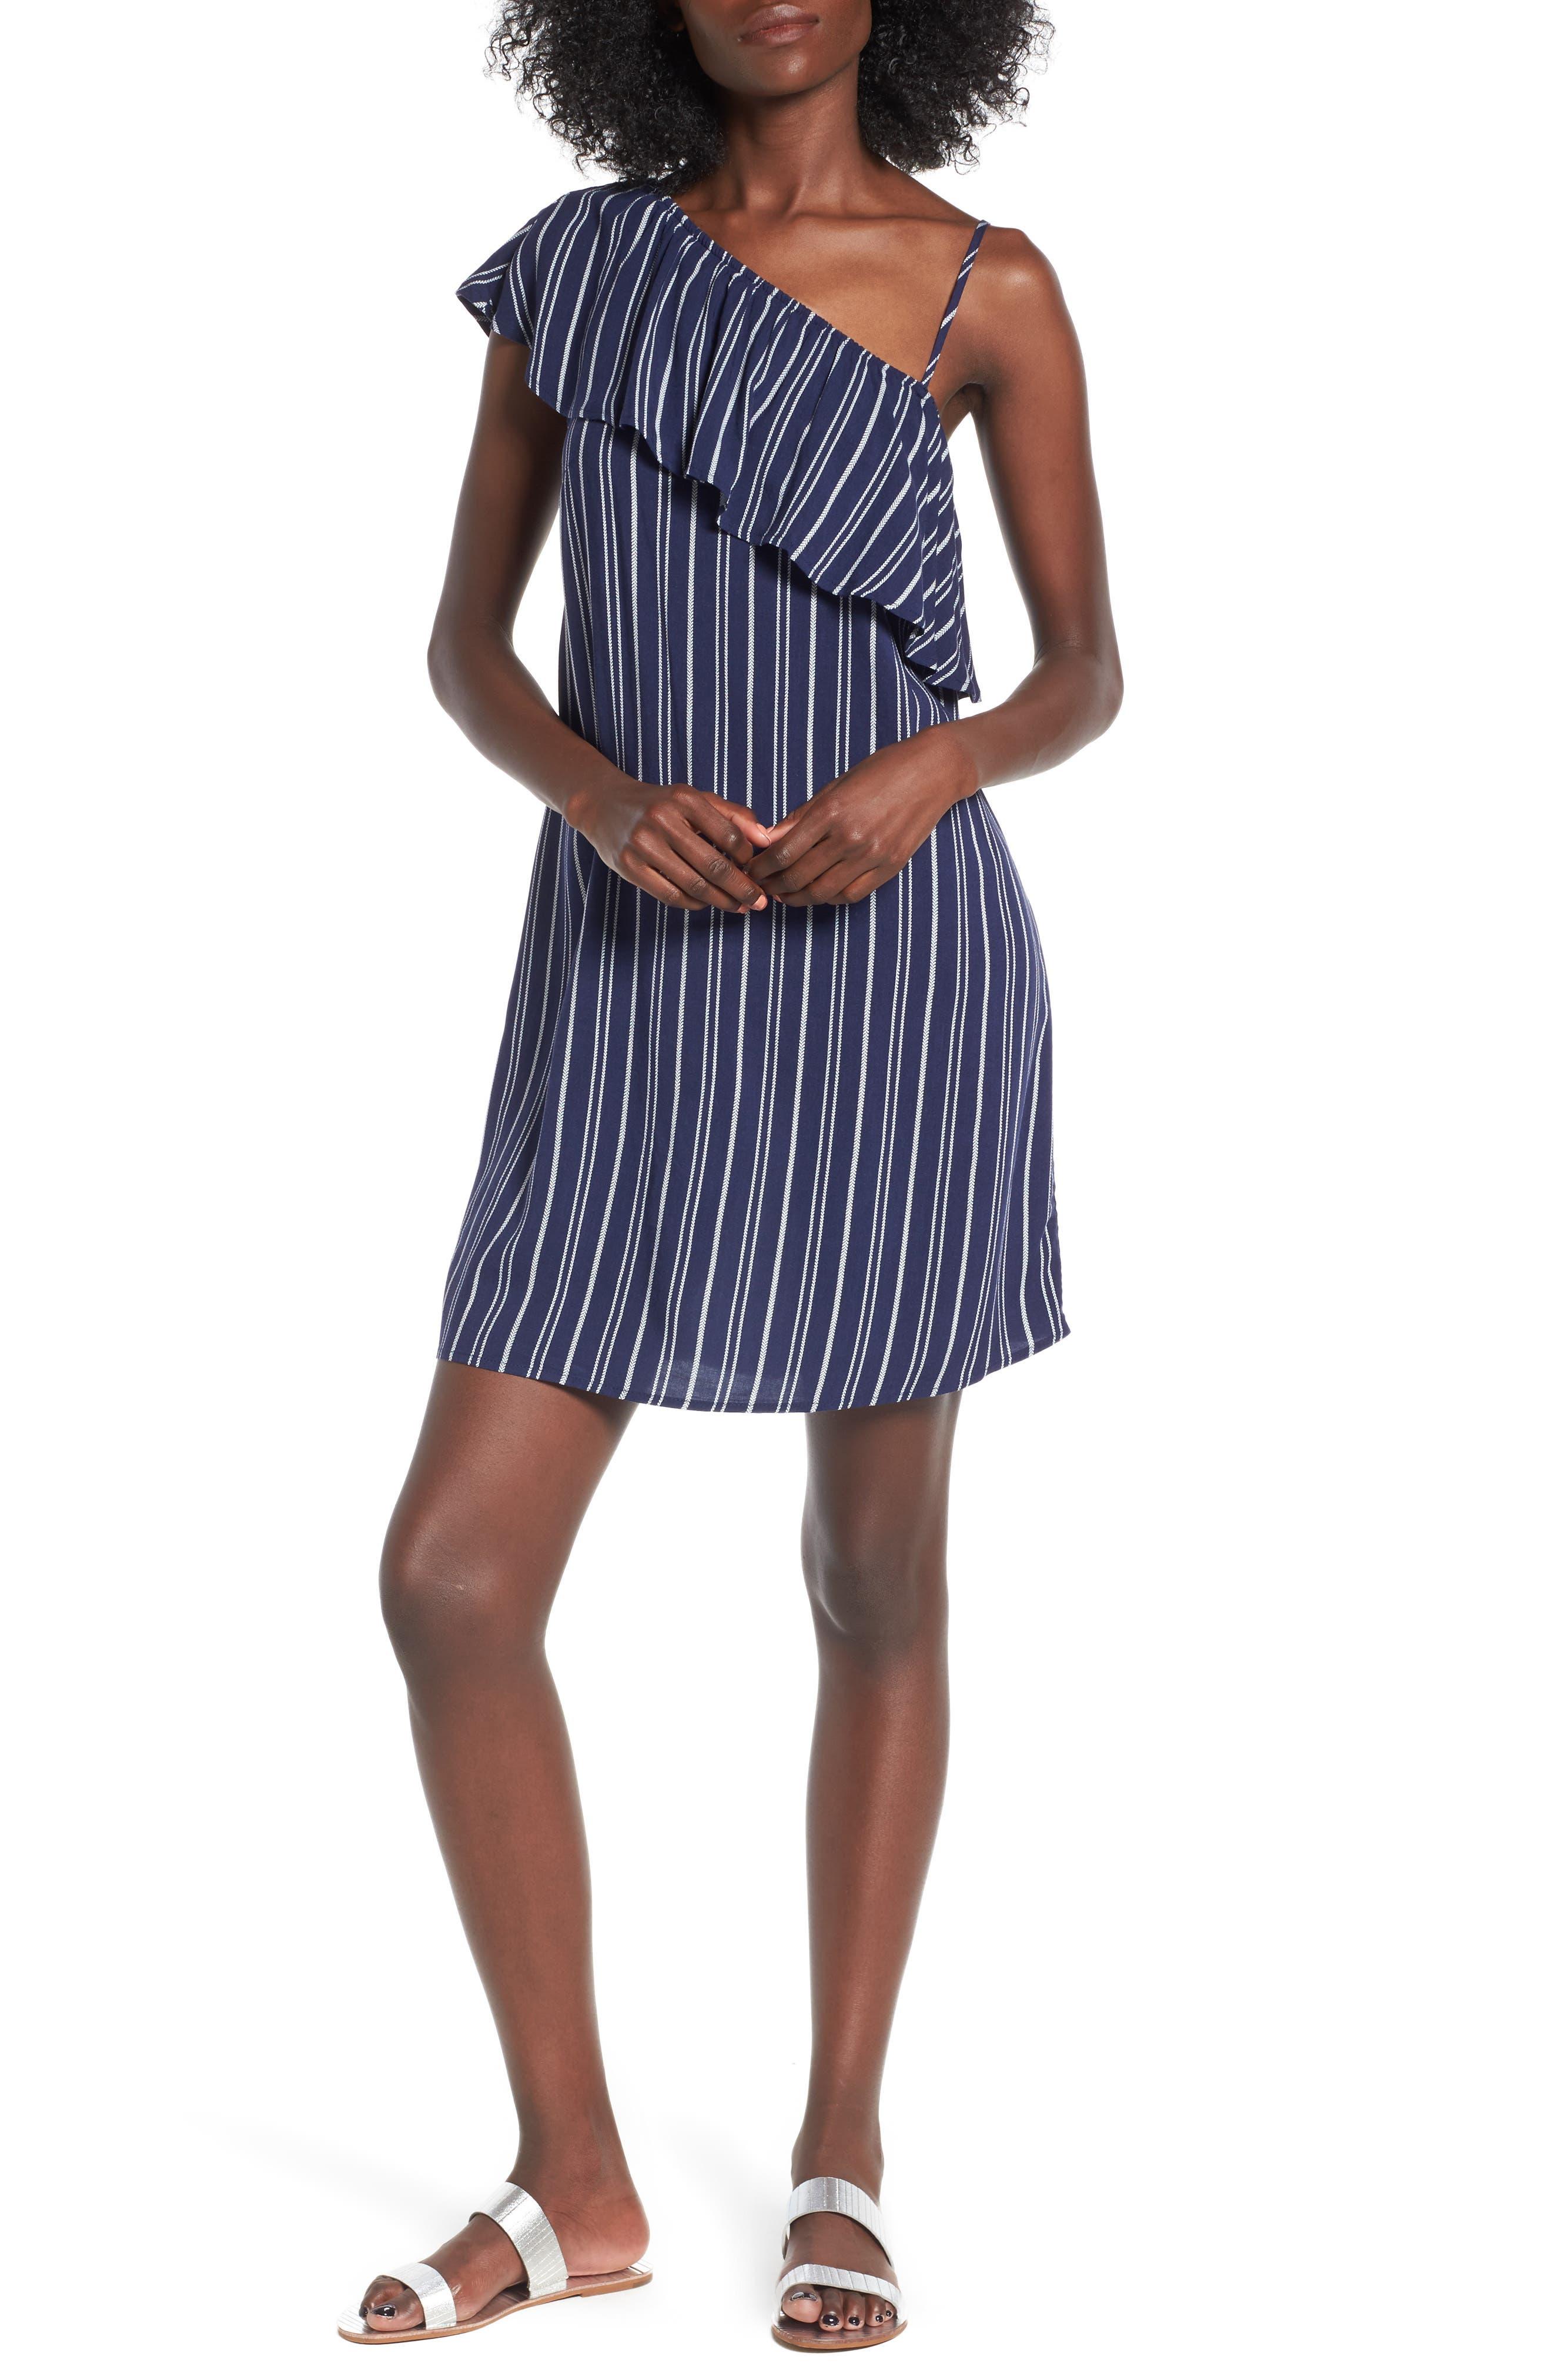 Alternate Image 1 Selected - Love, Fire Asymmetrical Ruffle Dress